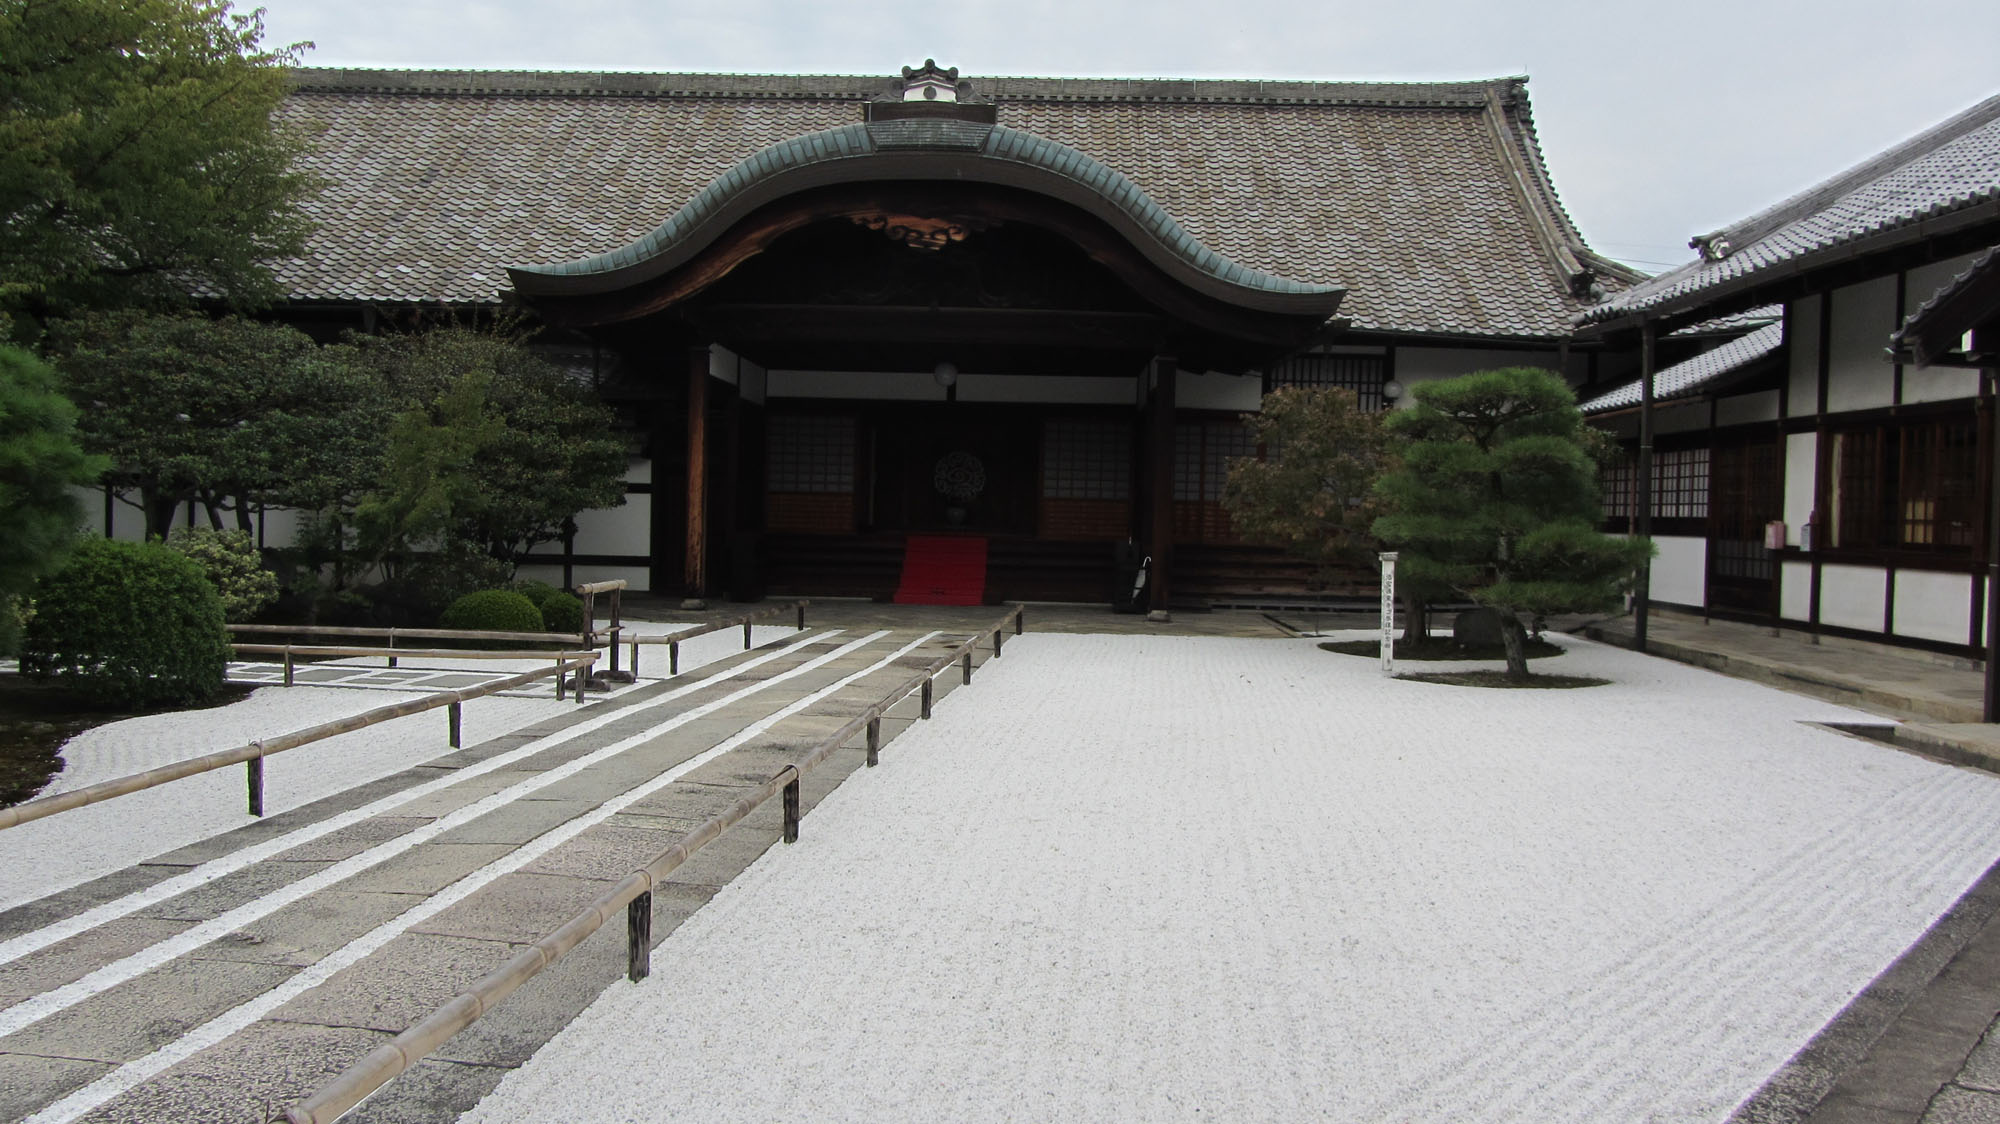 Templo to ji viajes de ark Villa jardin donde queda